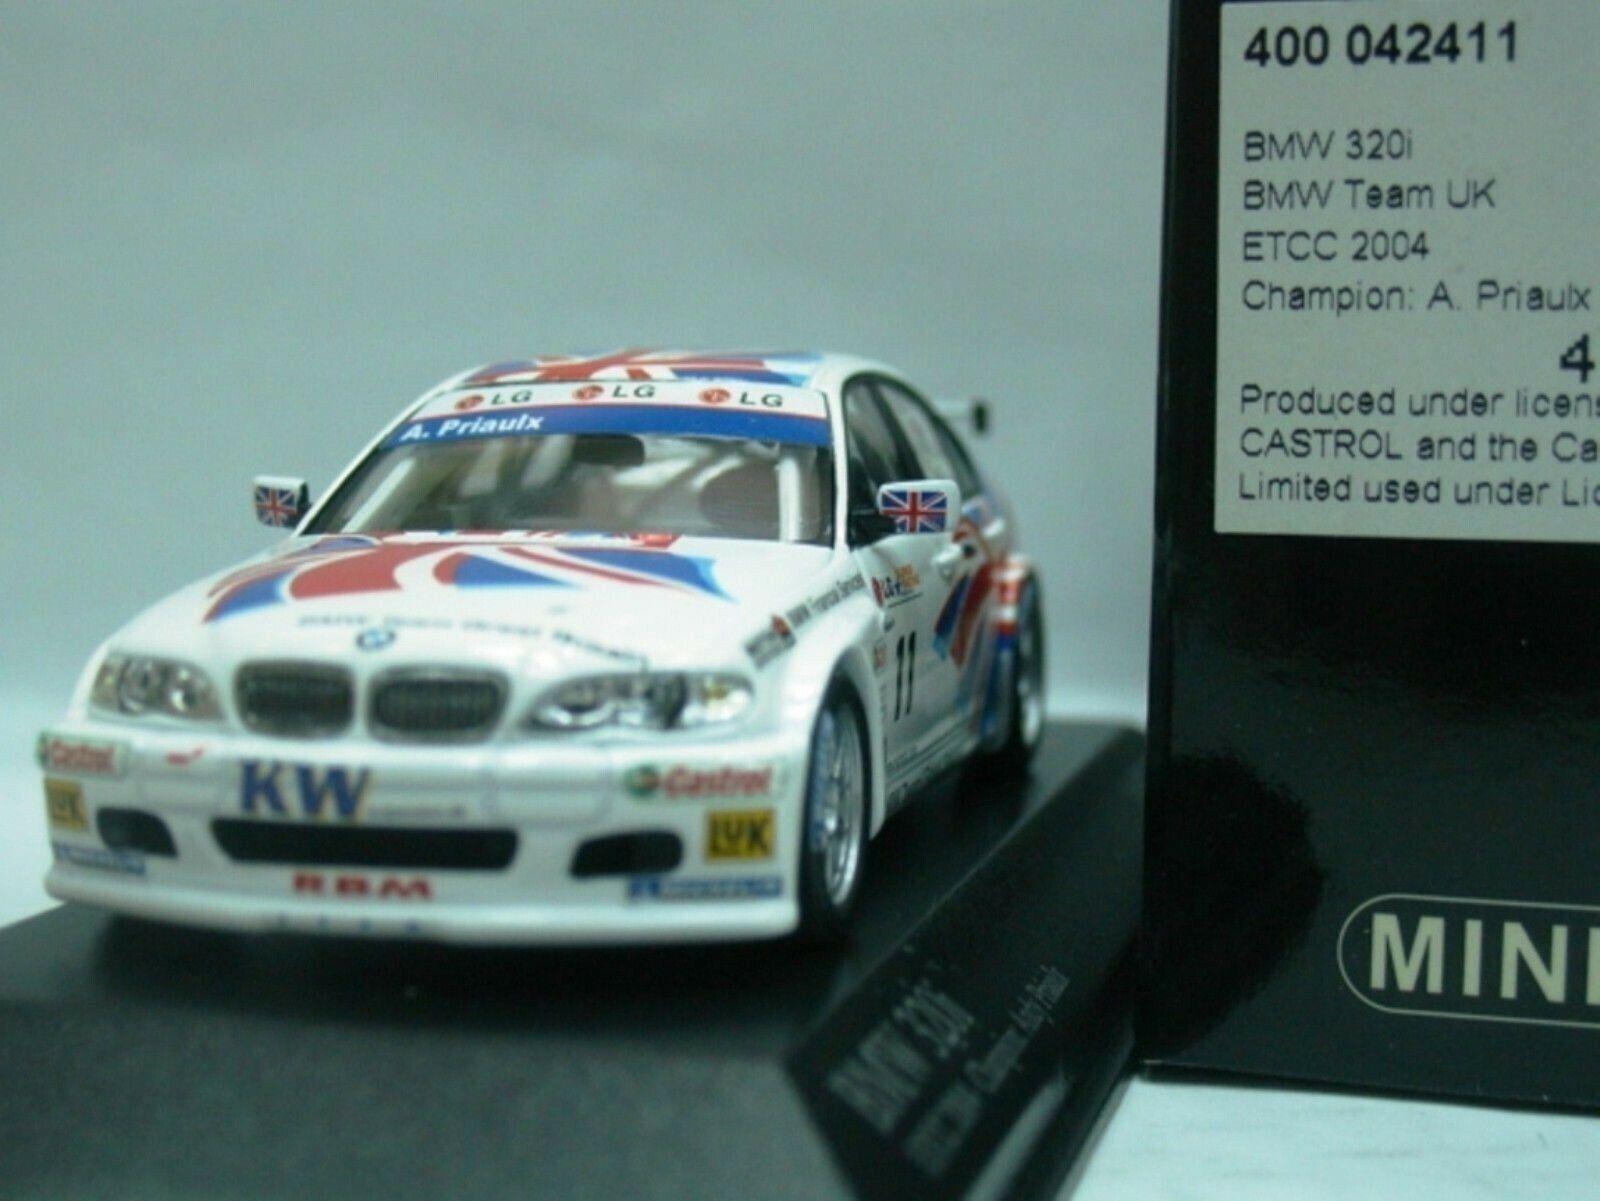 Wow extrêmement rare BMW E46 320i  11 Priaulx Donington 2004 ETCC 1 43 Minichamps